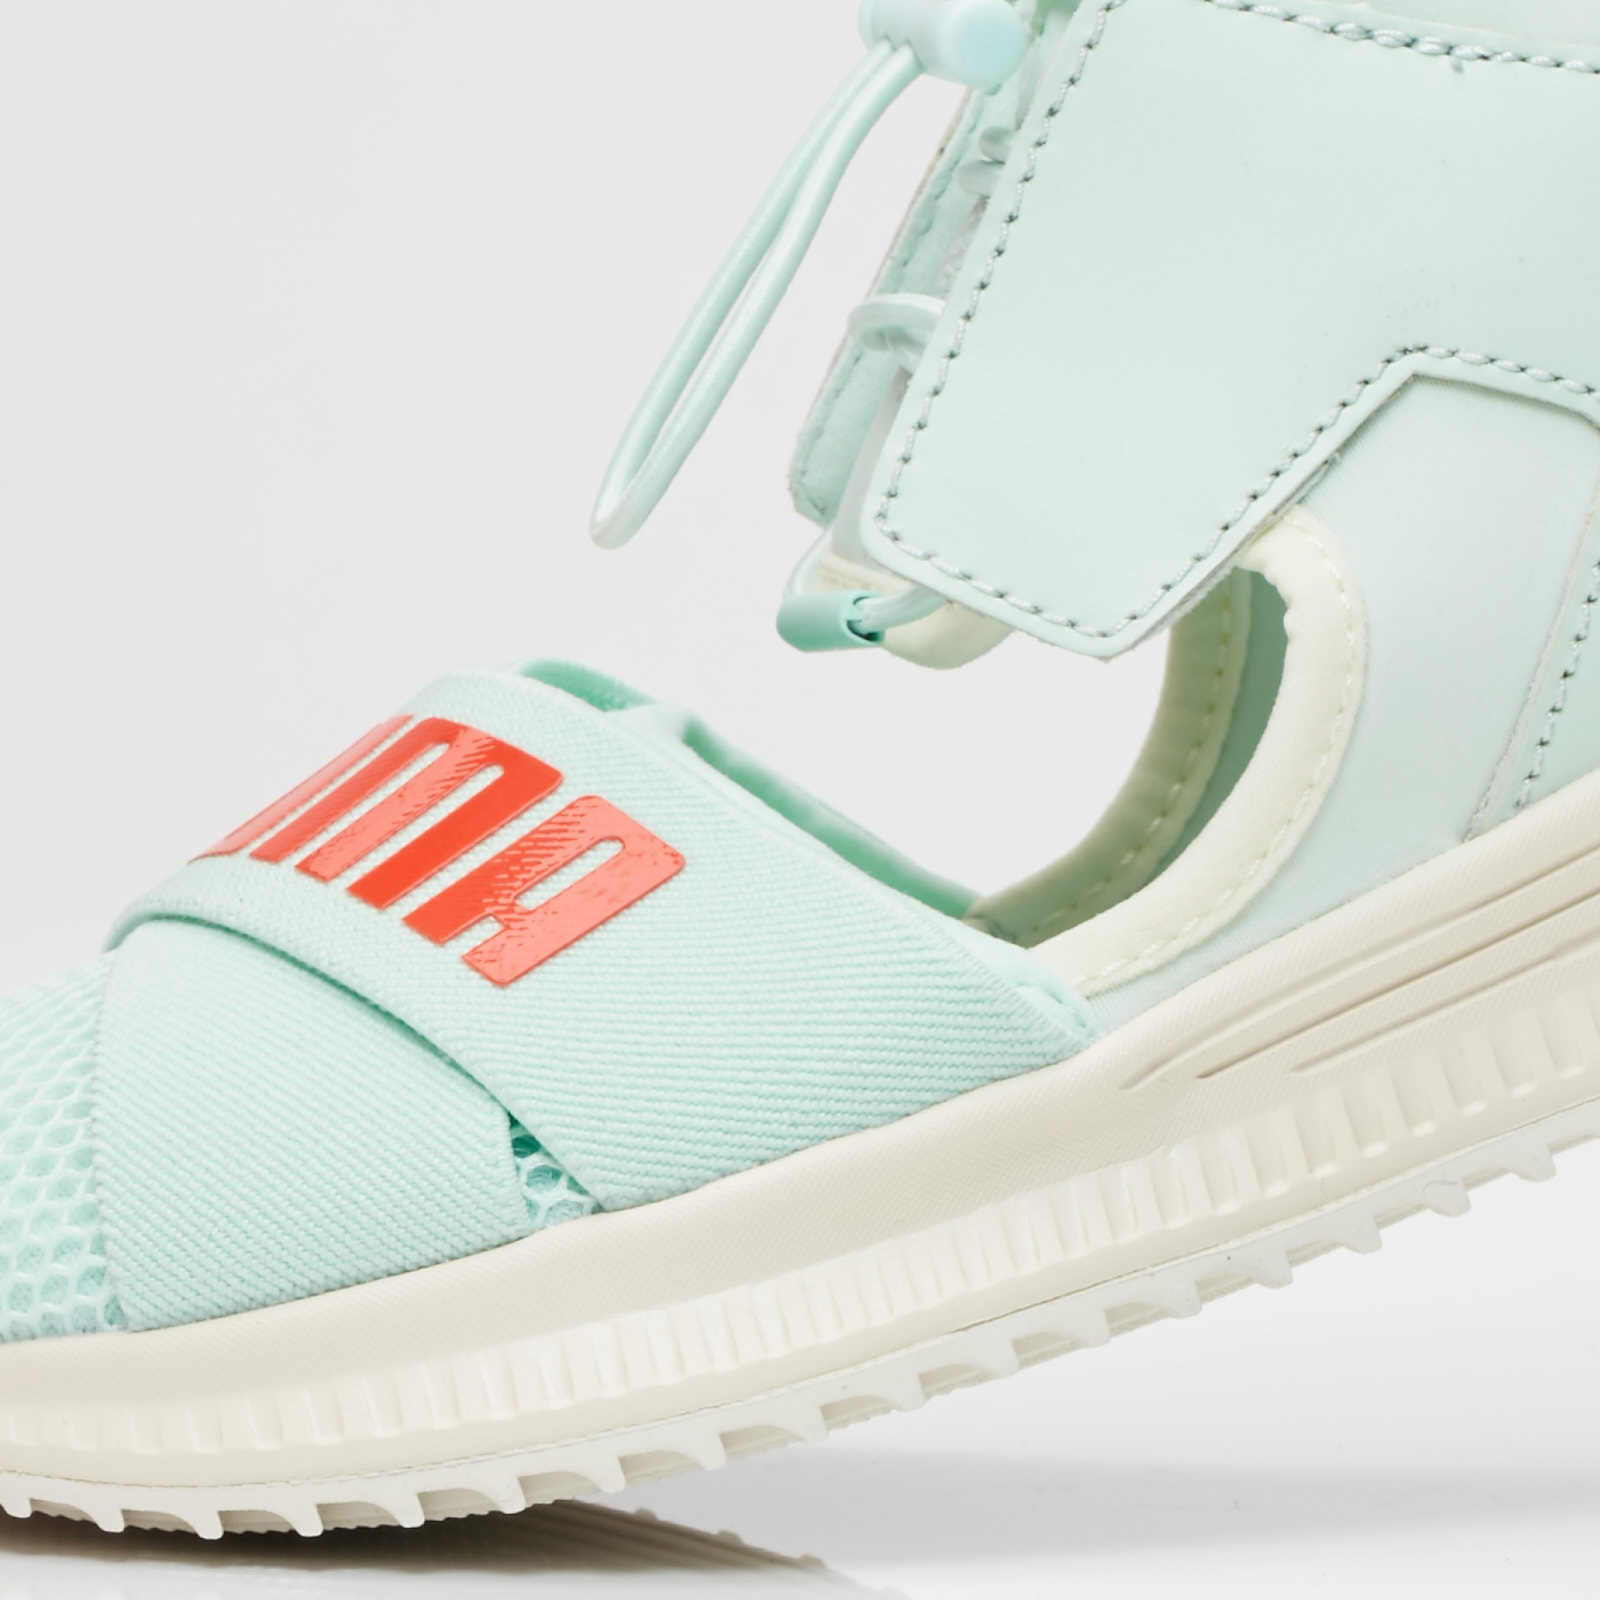 promo code d67f4 e0ed0 Puma Fenty Avid Wns - 367683-05 - Sneakersnstuff | sneakers ...